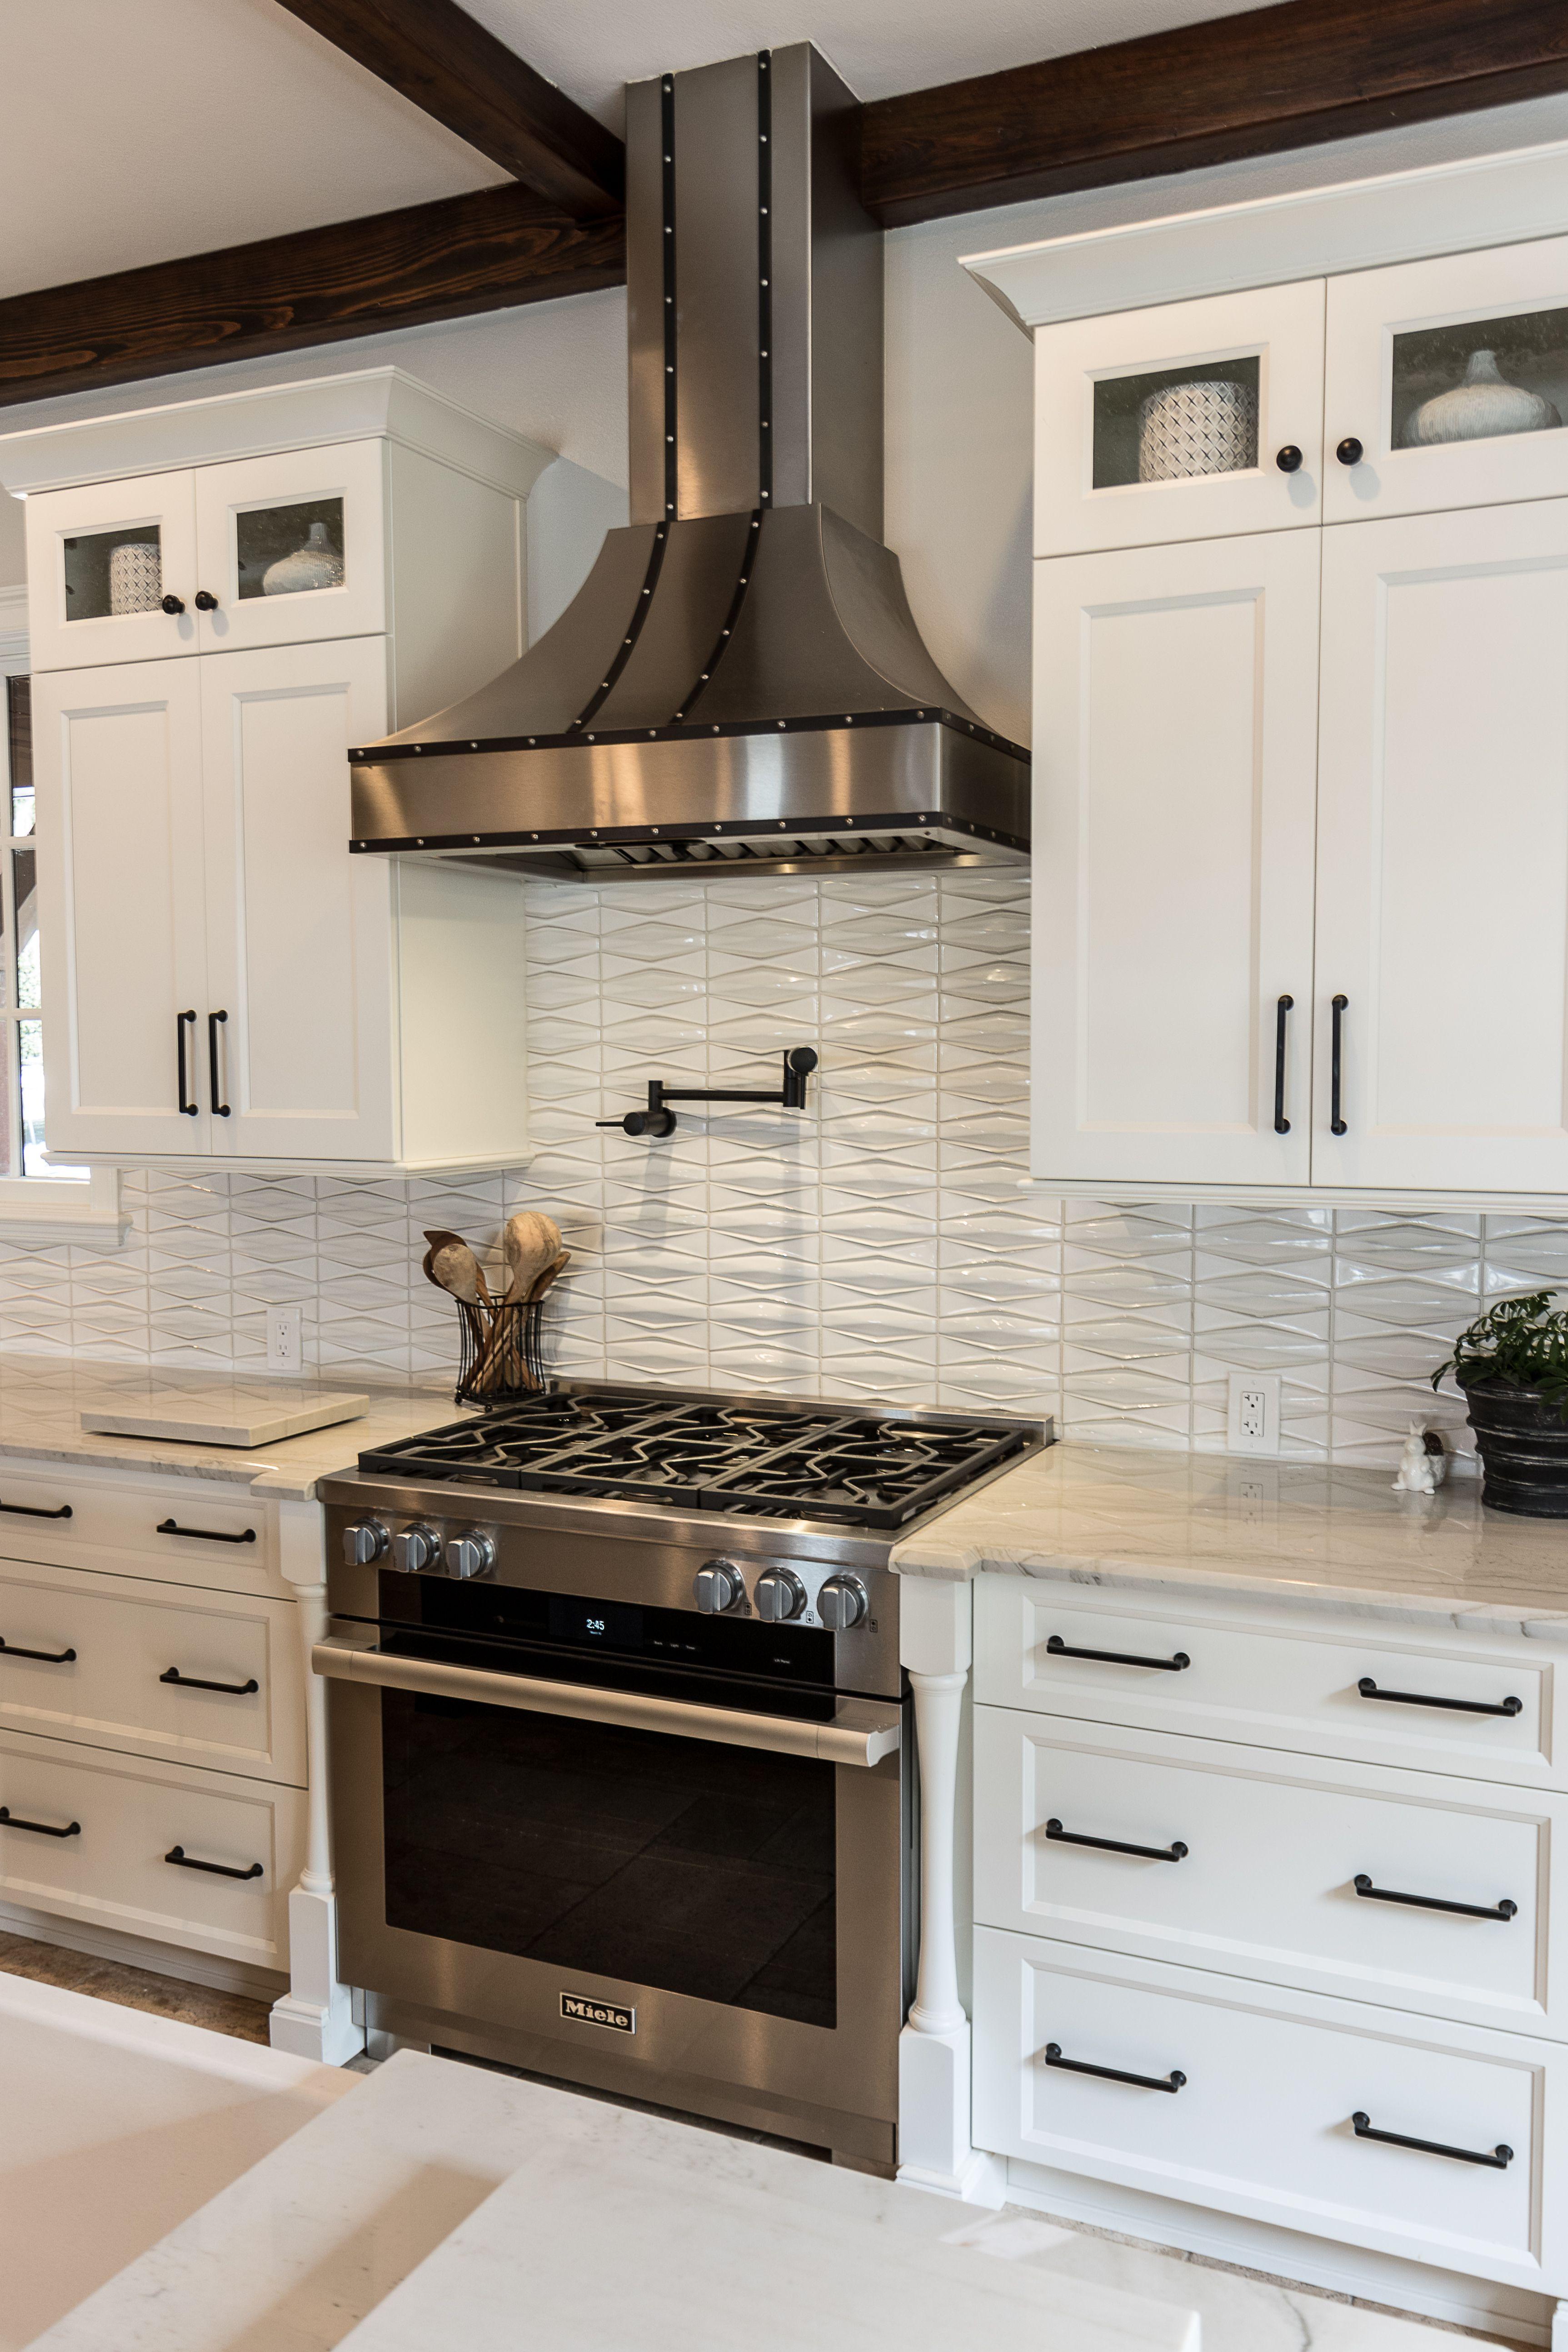 Windermere Kitchen Remodel Kbf Design Gallery In 2020 Kitchen Remodel Traditional Kitchen Remodel Rustic Kitchen Cabinets